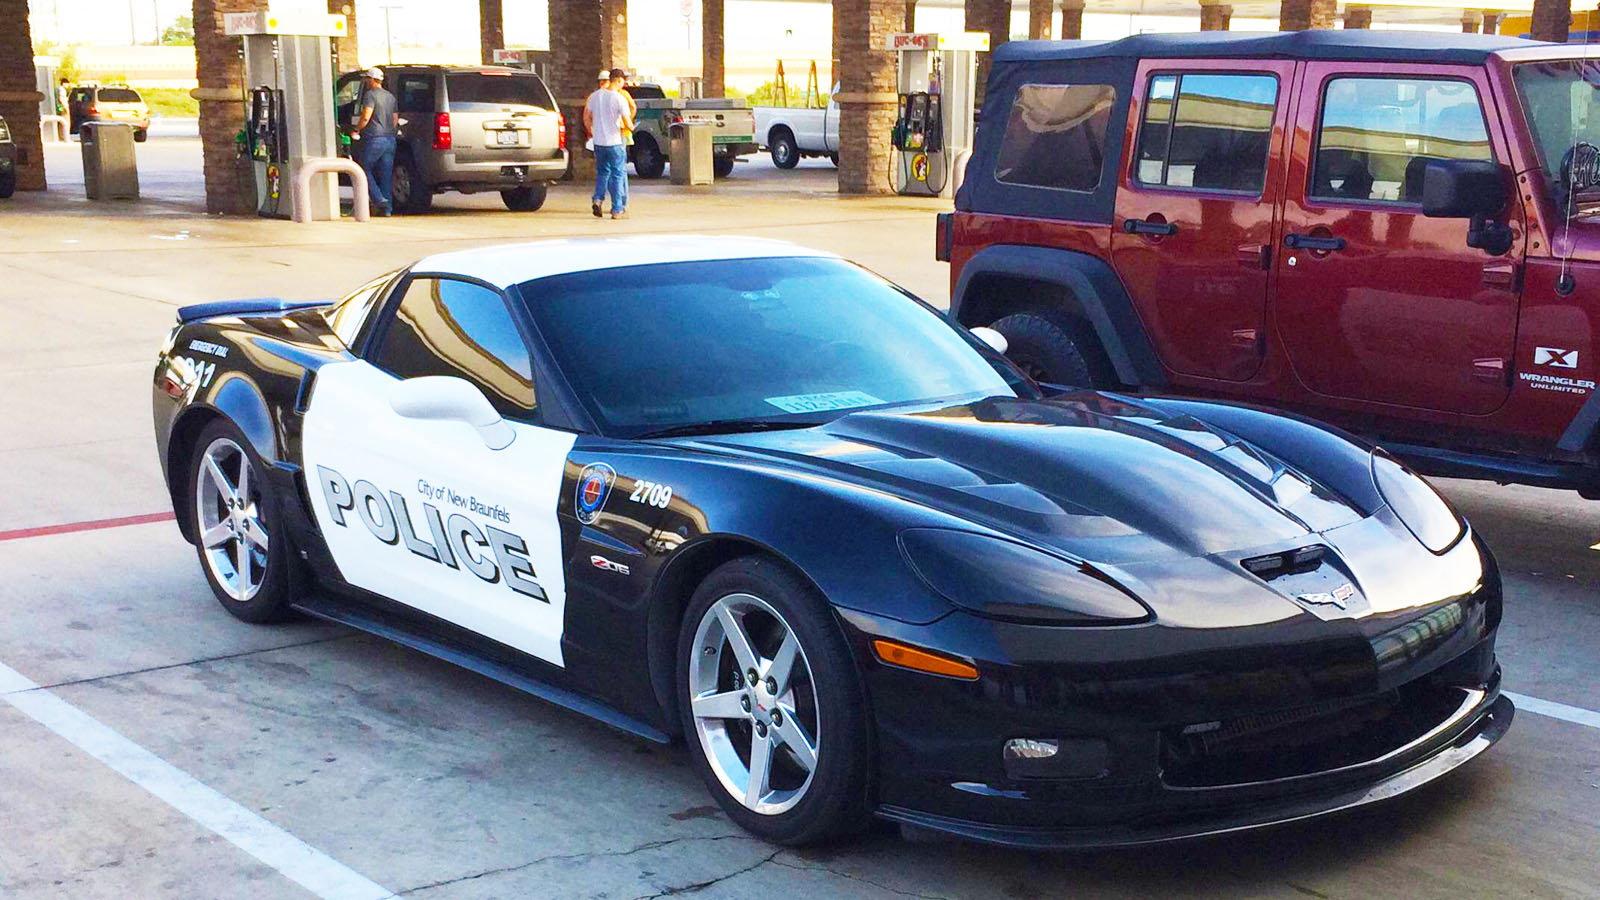 4 Pics of a Z06 Texas Police Car | Ls1tech